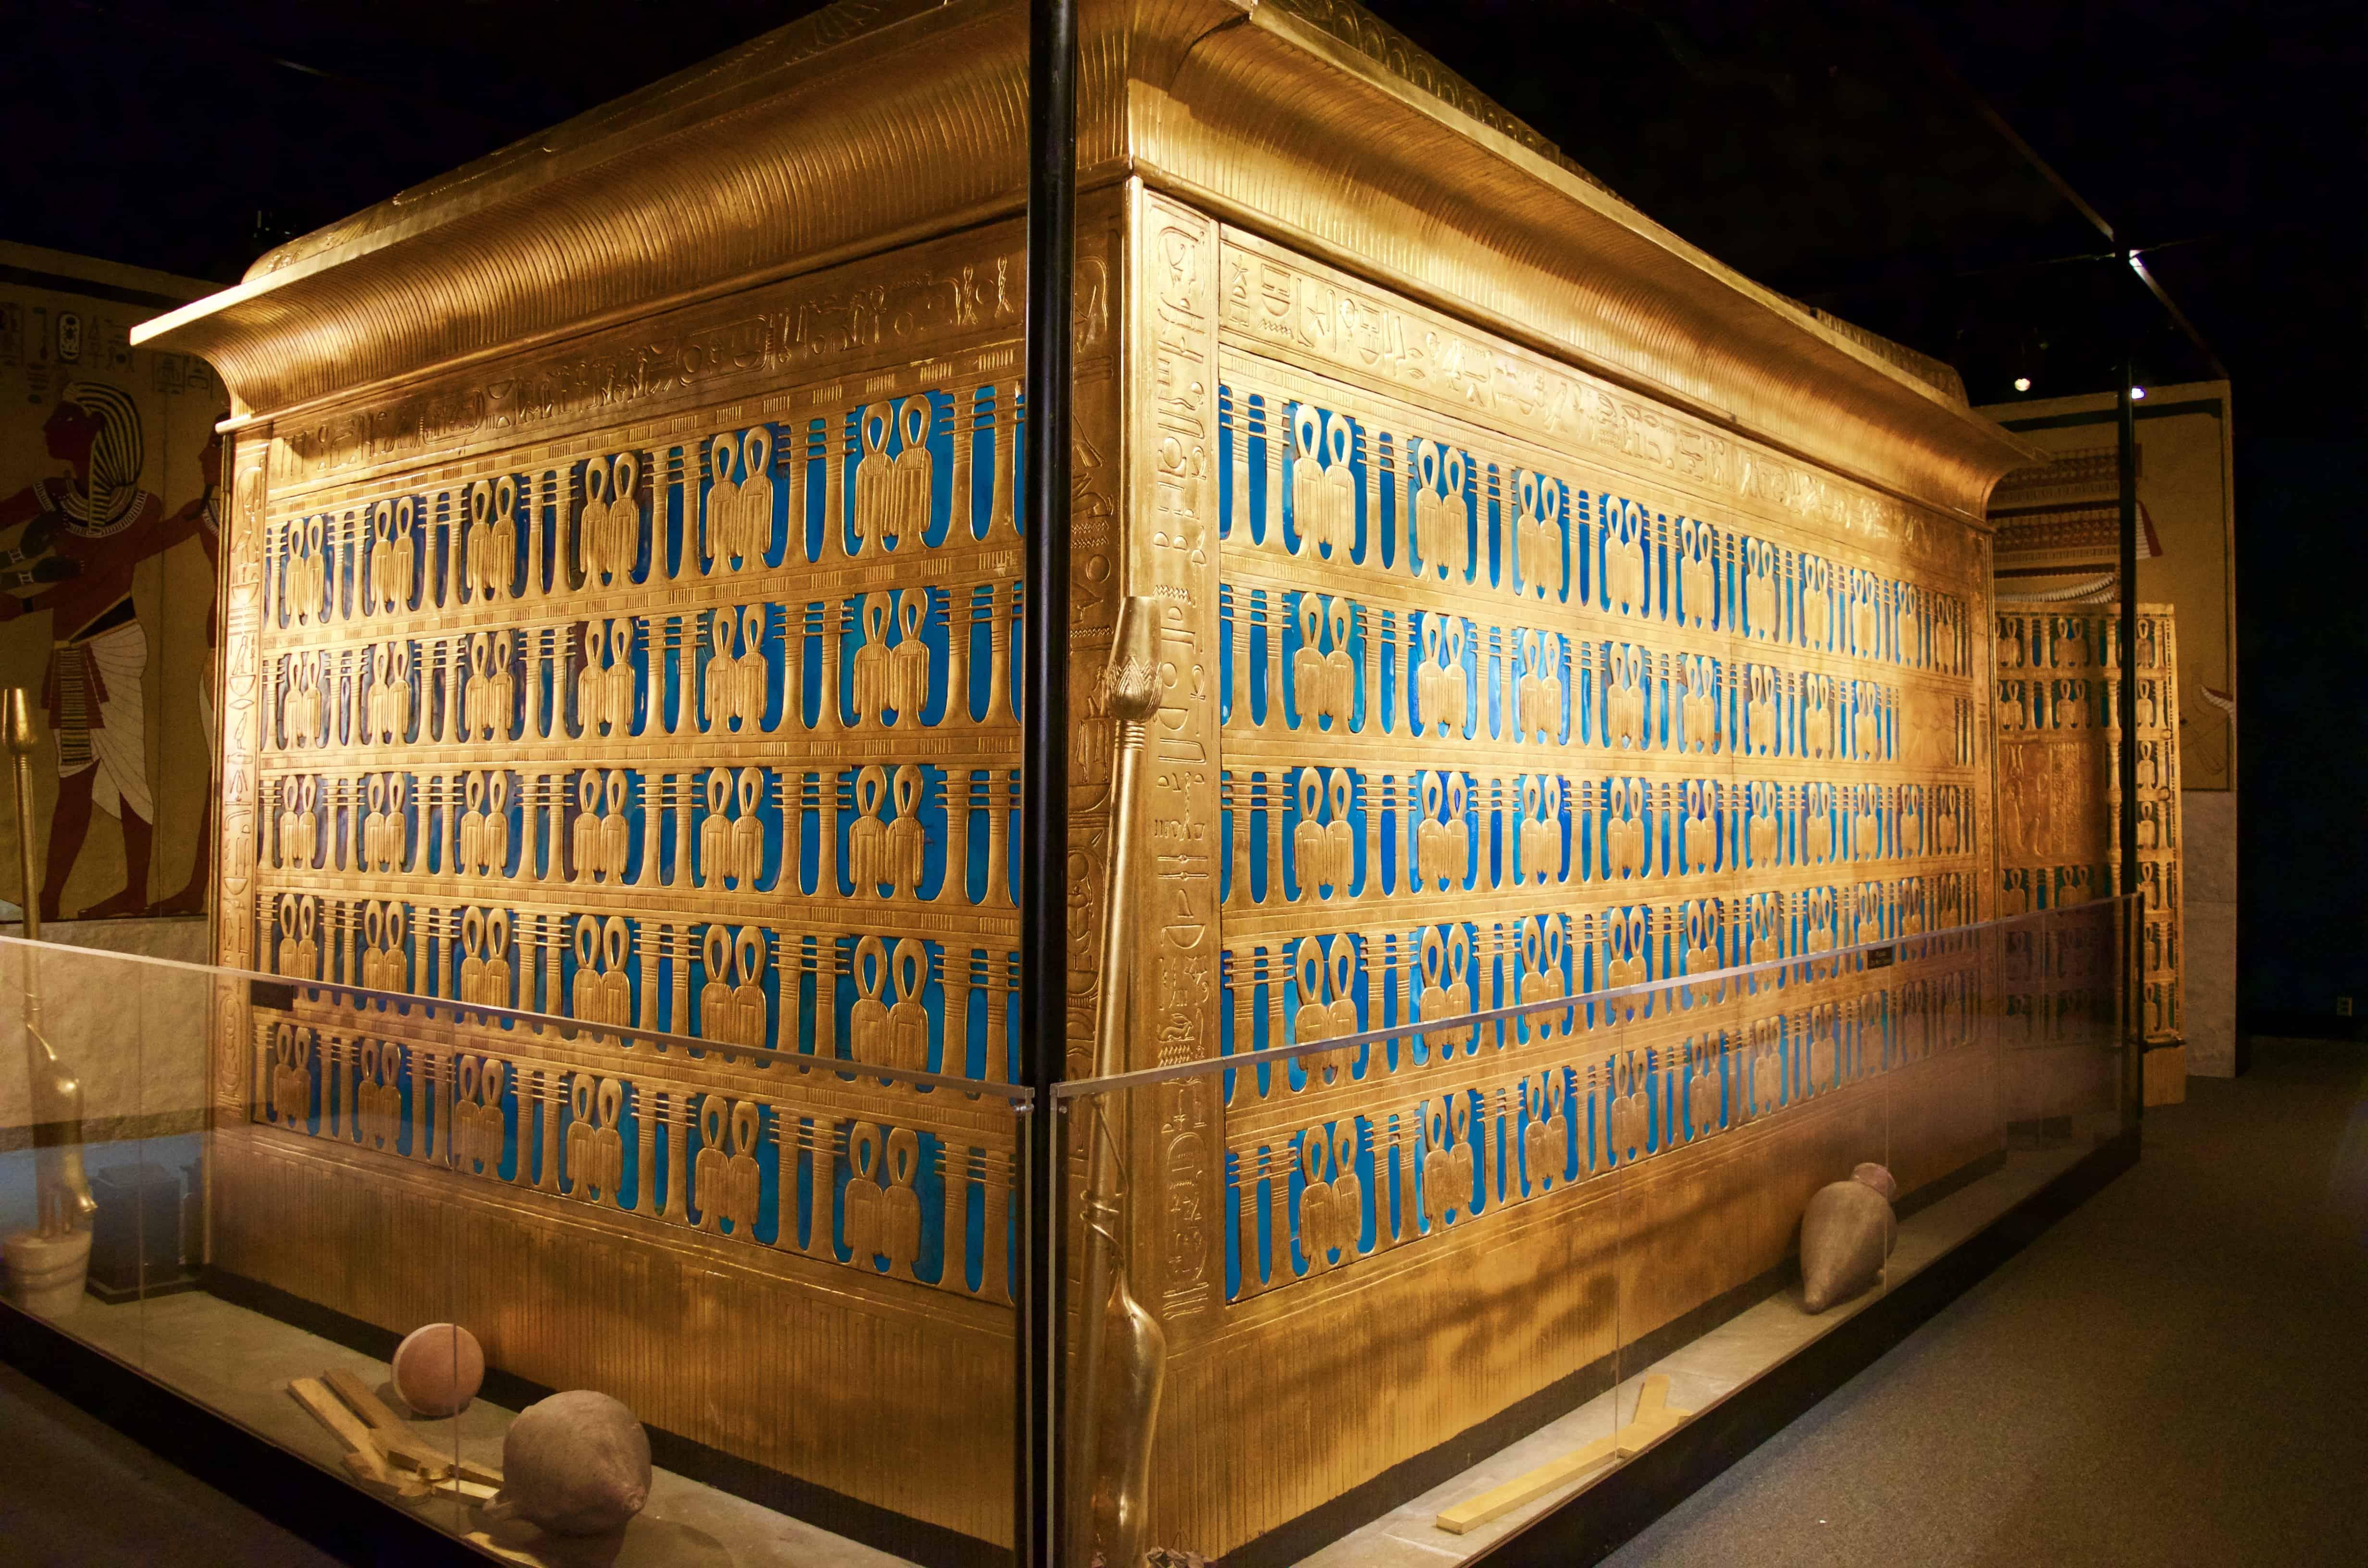 The Stunning King Tut Exhibit at the Putnam Museum